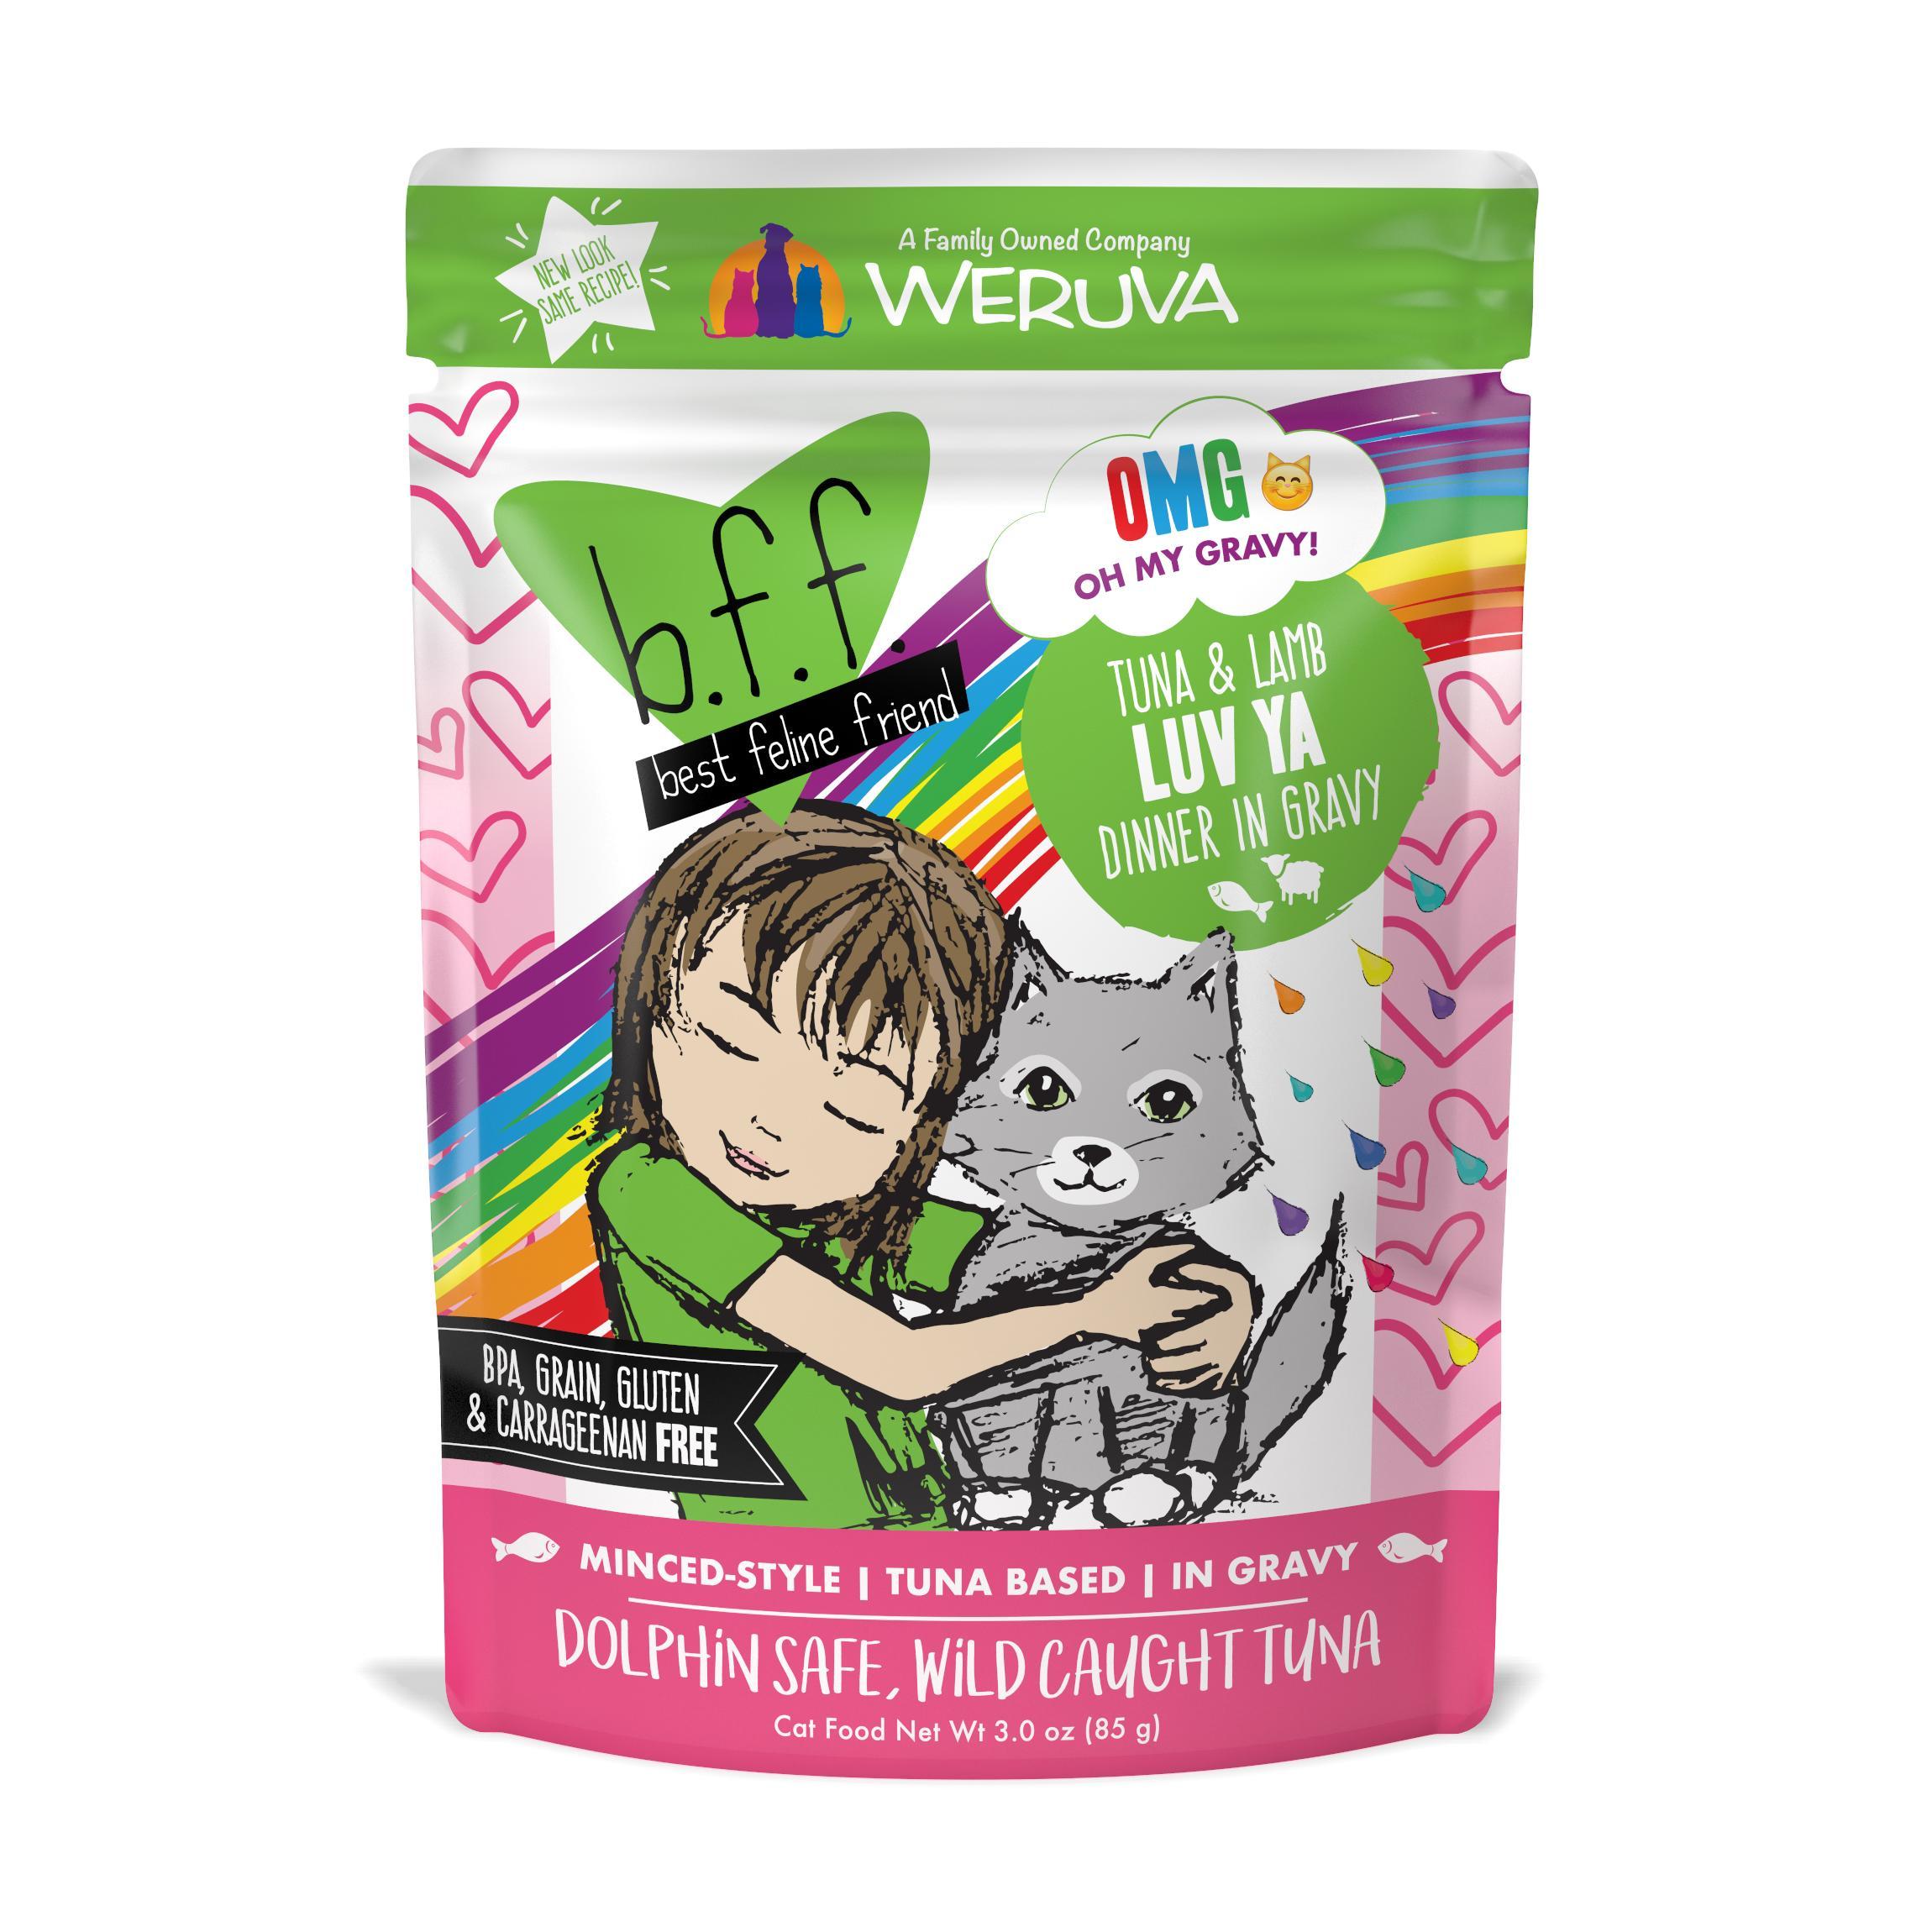 BFF Oh My Gravy! Luv Ya Tuna & Lamb Dinner in Gravy Grain-Free Wet Cat Food, 3-oz